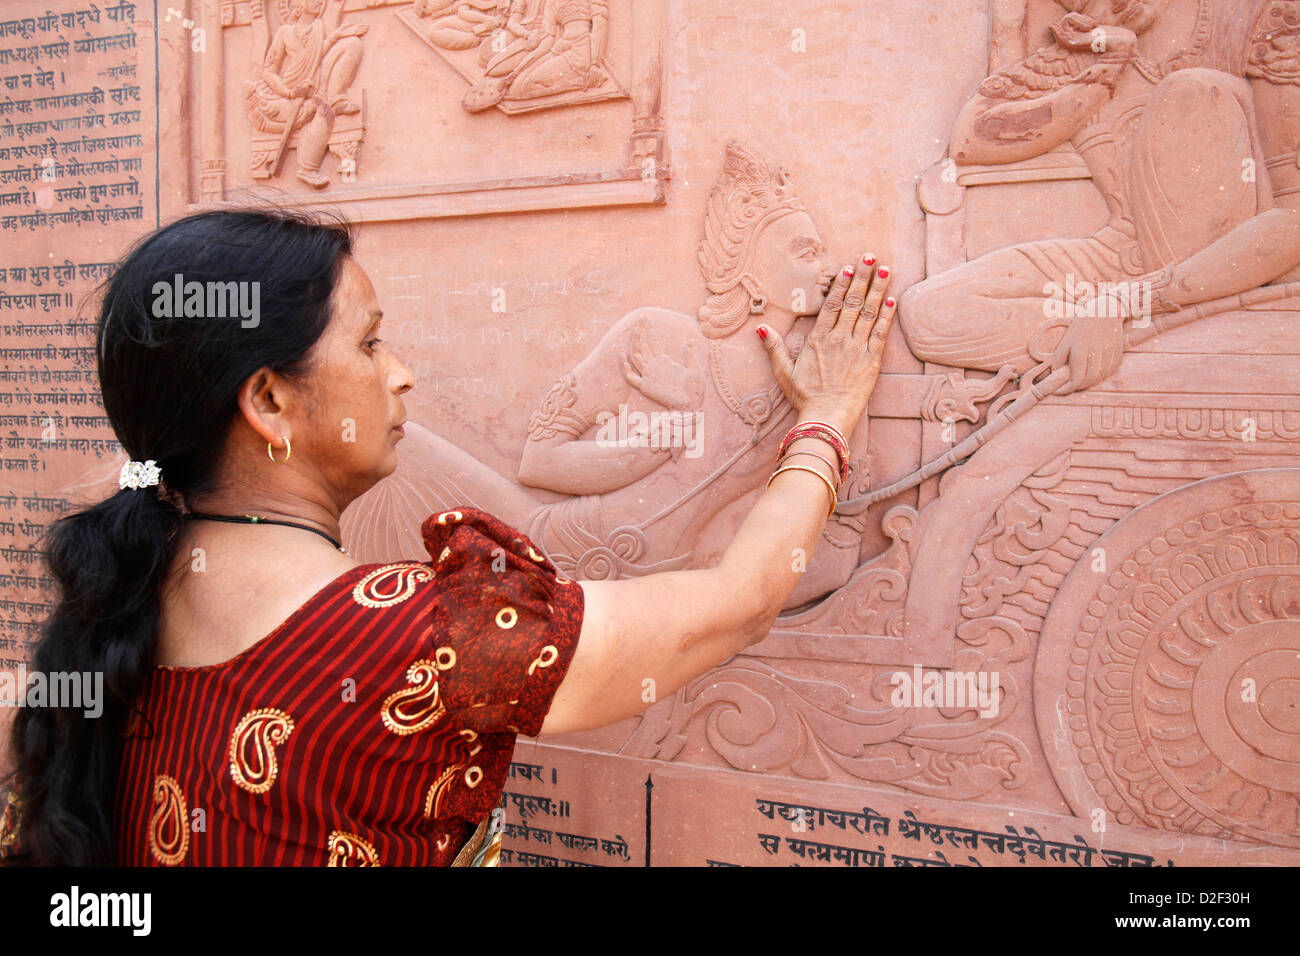 Bhagavad Gita engraved on a Hindu temple . Mathurai. India. - Stock Image